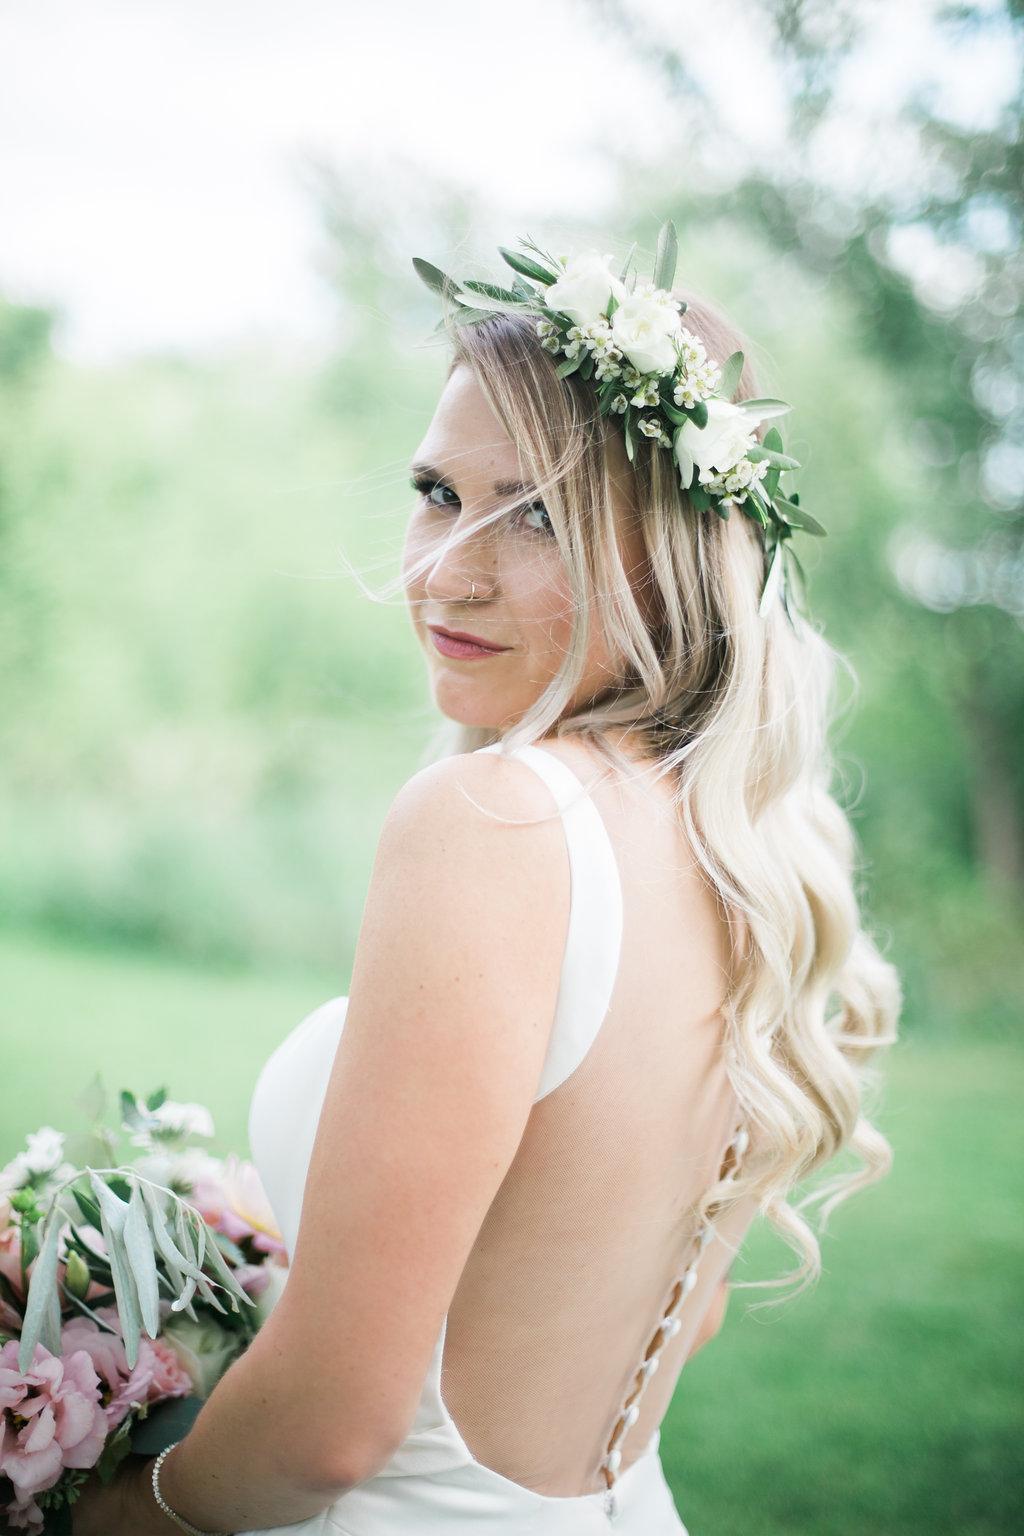 Bridal Hair Flowers - Floral Crown Ideas